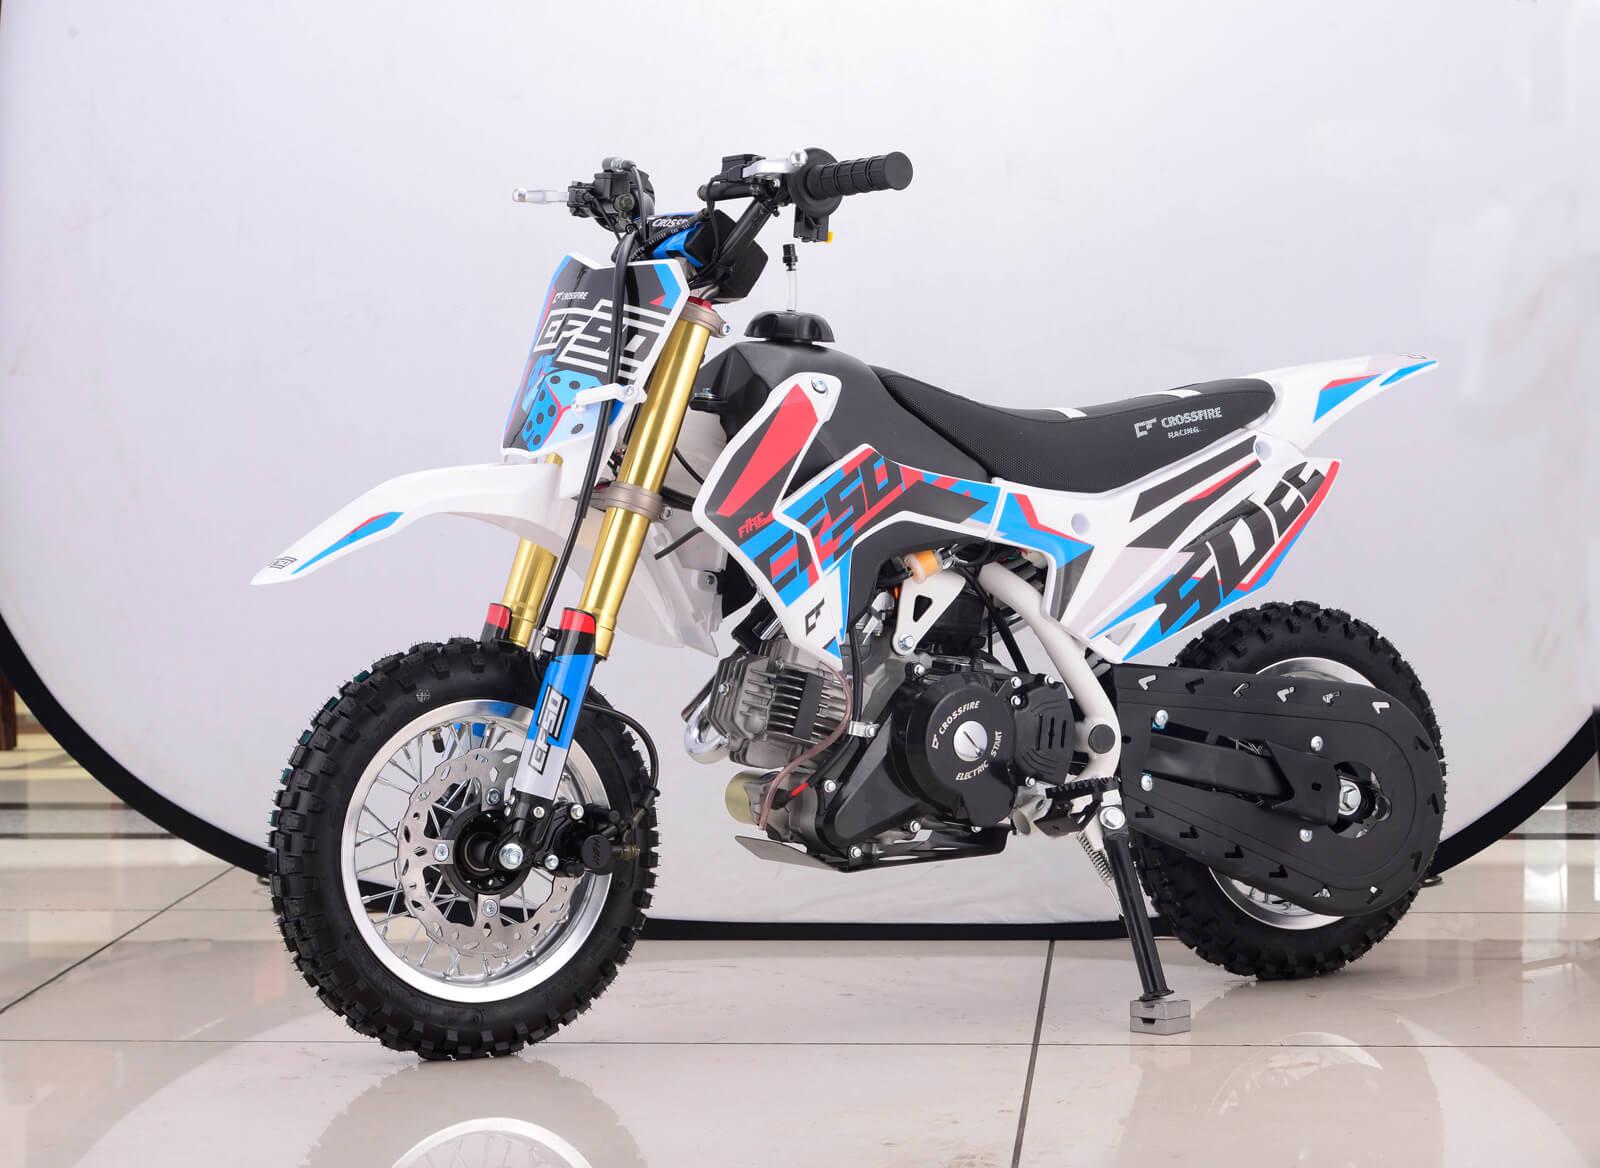 motorbike a photo  Crossfire Motorcycles - CF110 110cc Dirt Bike